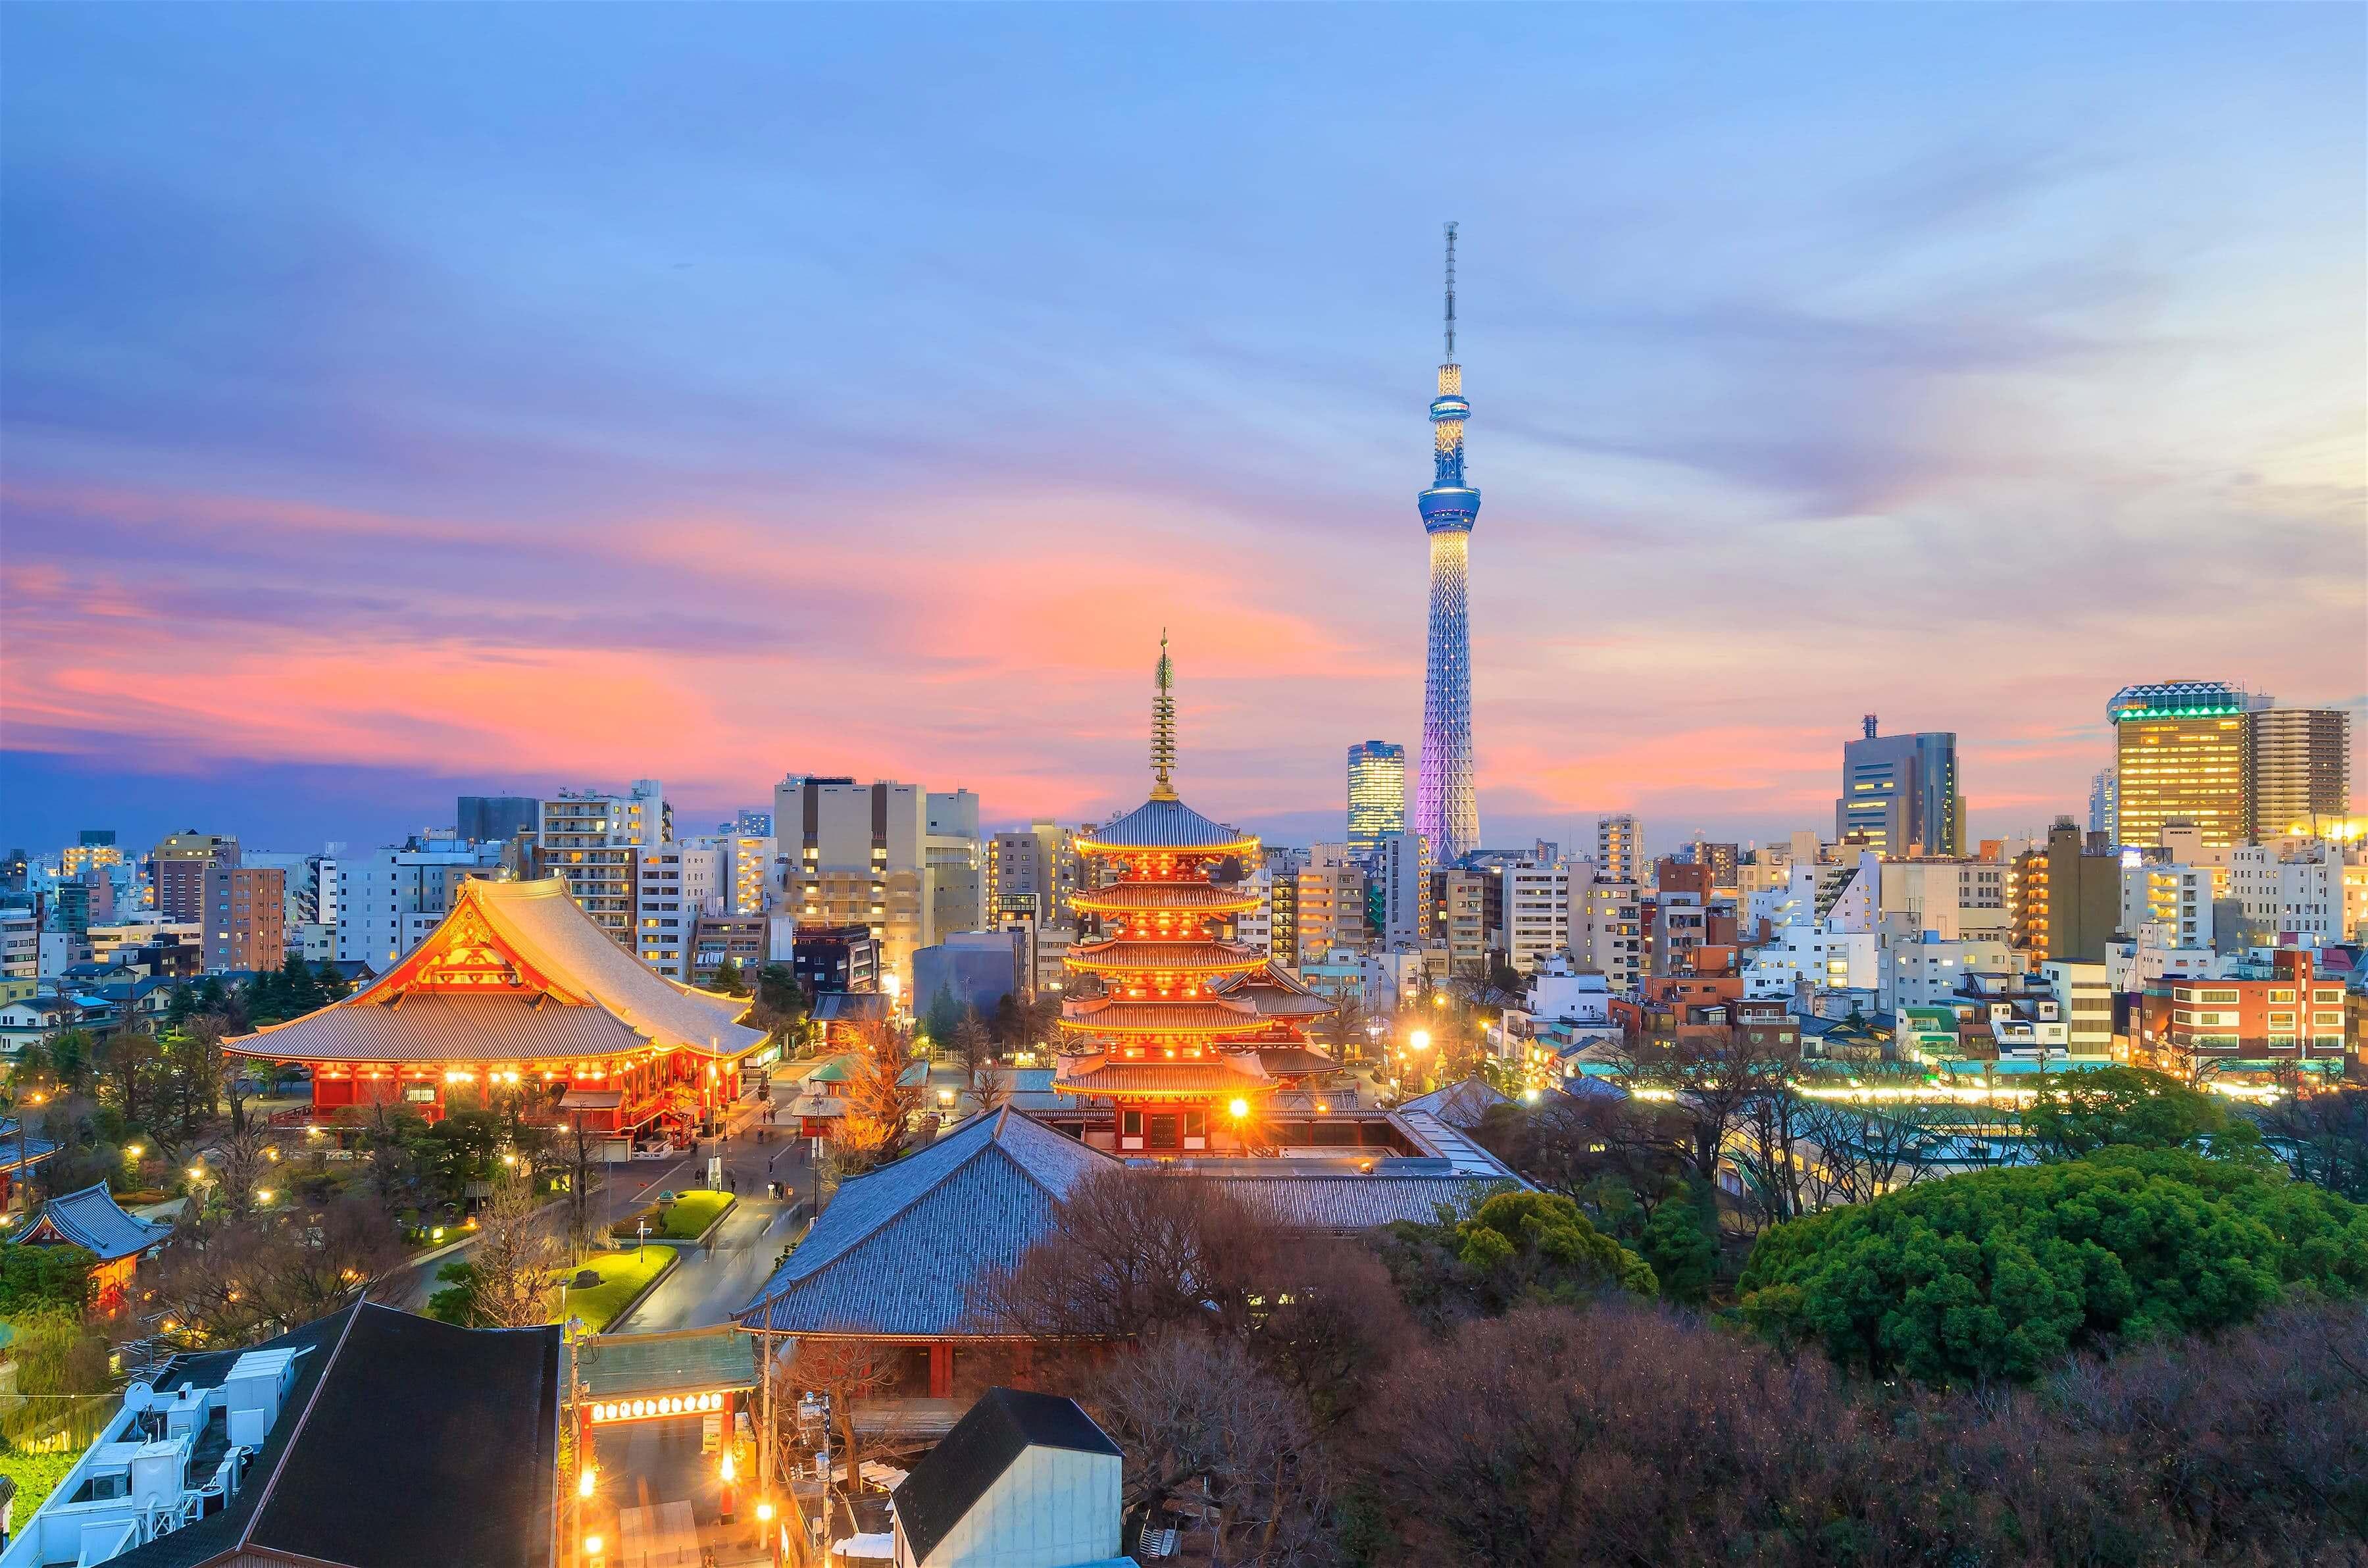 Jepang - Mencicipi Serunya Liburan ke Negara Favorit Para Artis